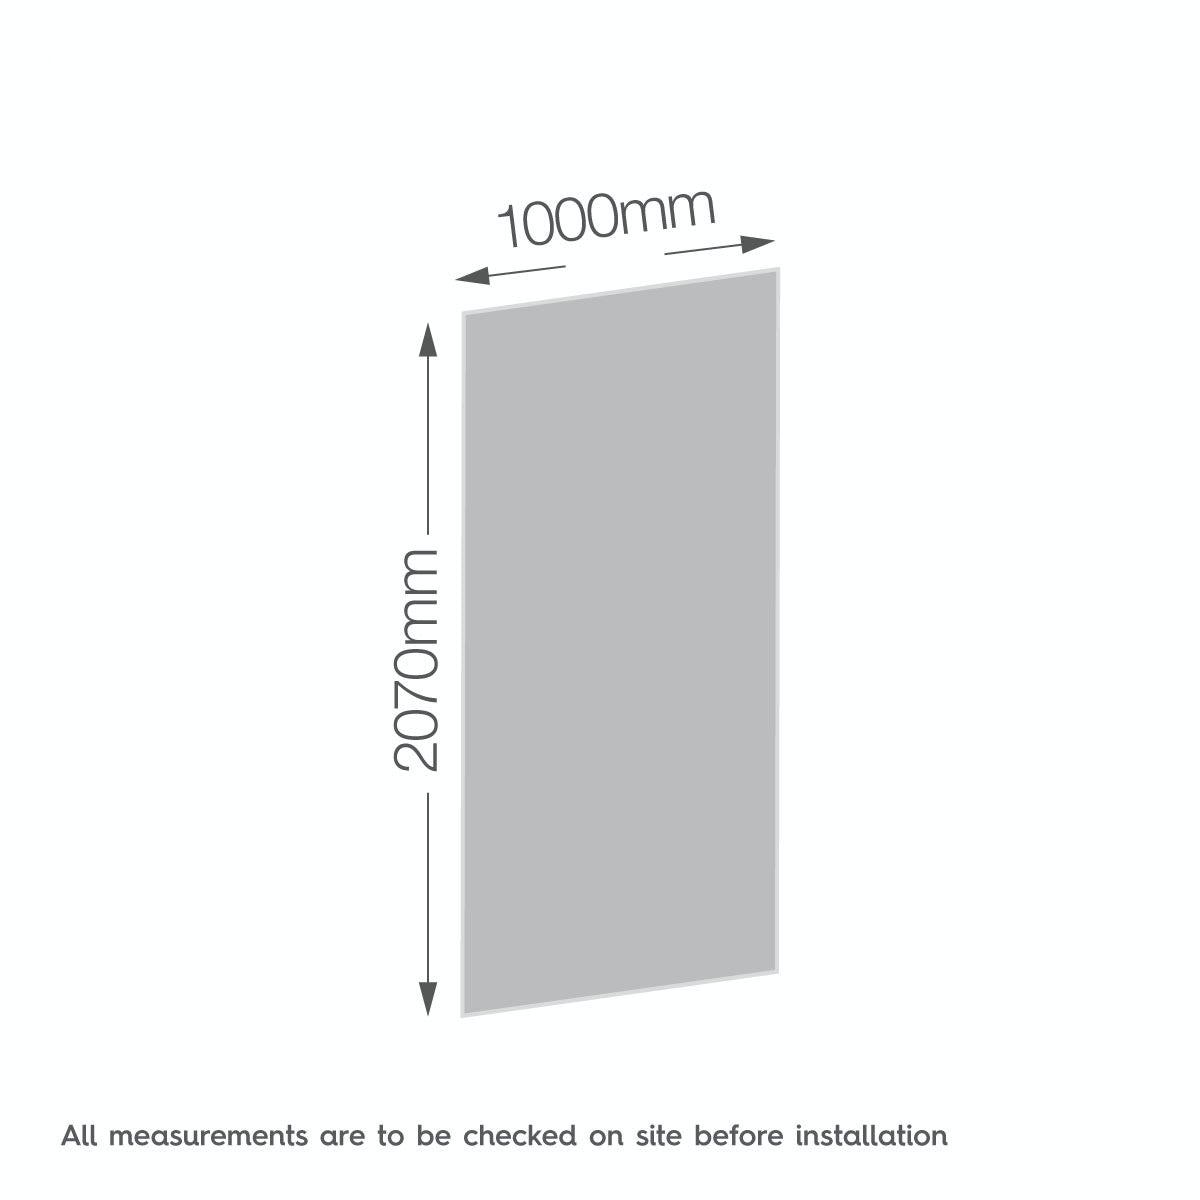 Dimensions for Zenolite plus earth acrylic shower wall panel 2070 x 1000